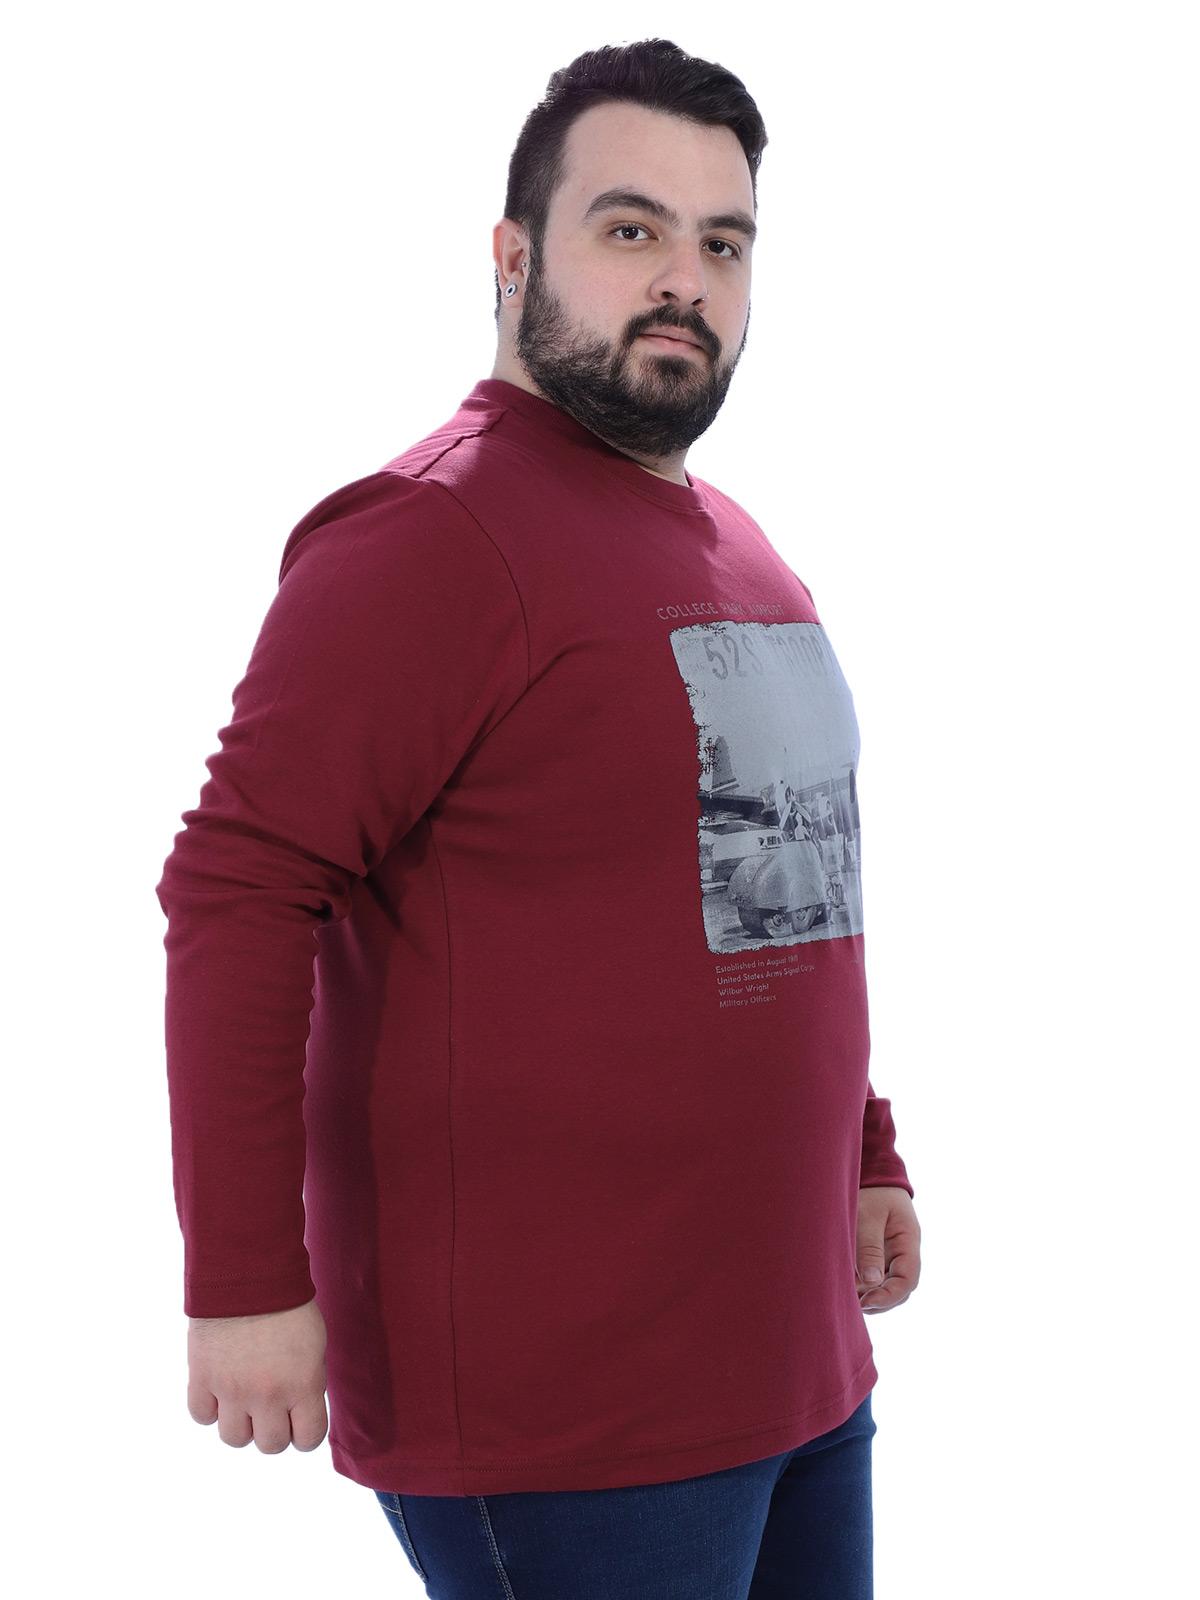 Blusa Plus Size Masculino Manga Longa Gola Careca Air Vinho